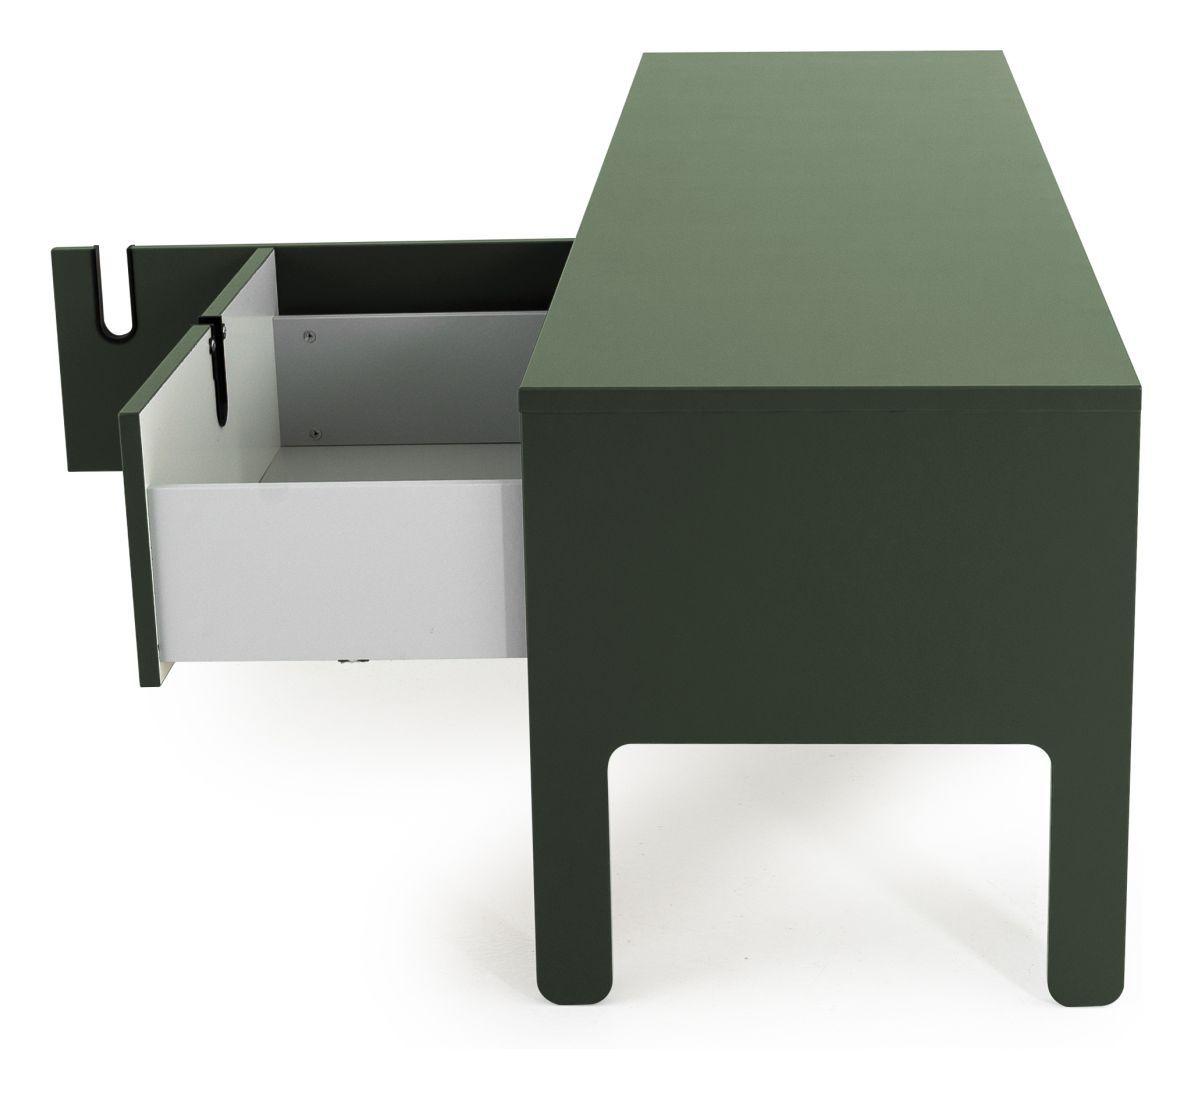 TENZO - Uno TV-bænk m. skuffe, Grøn